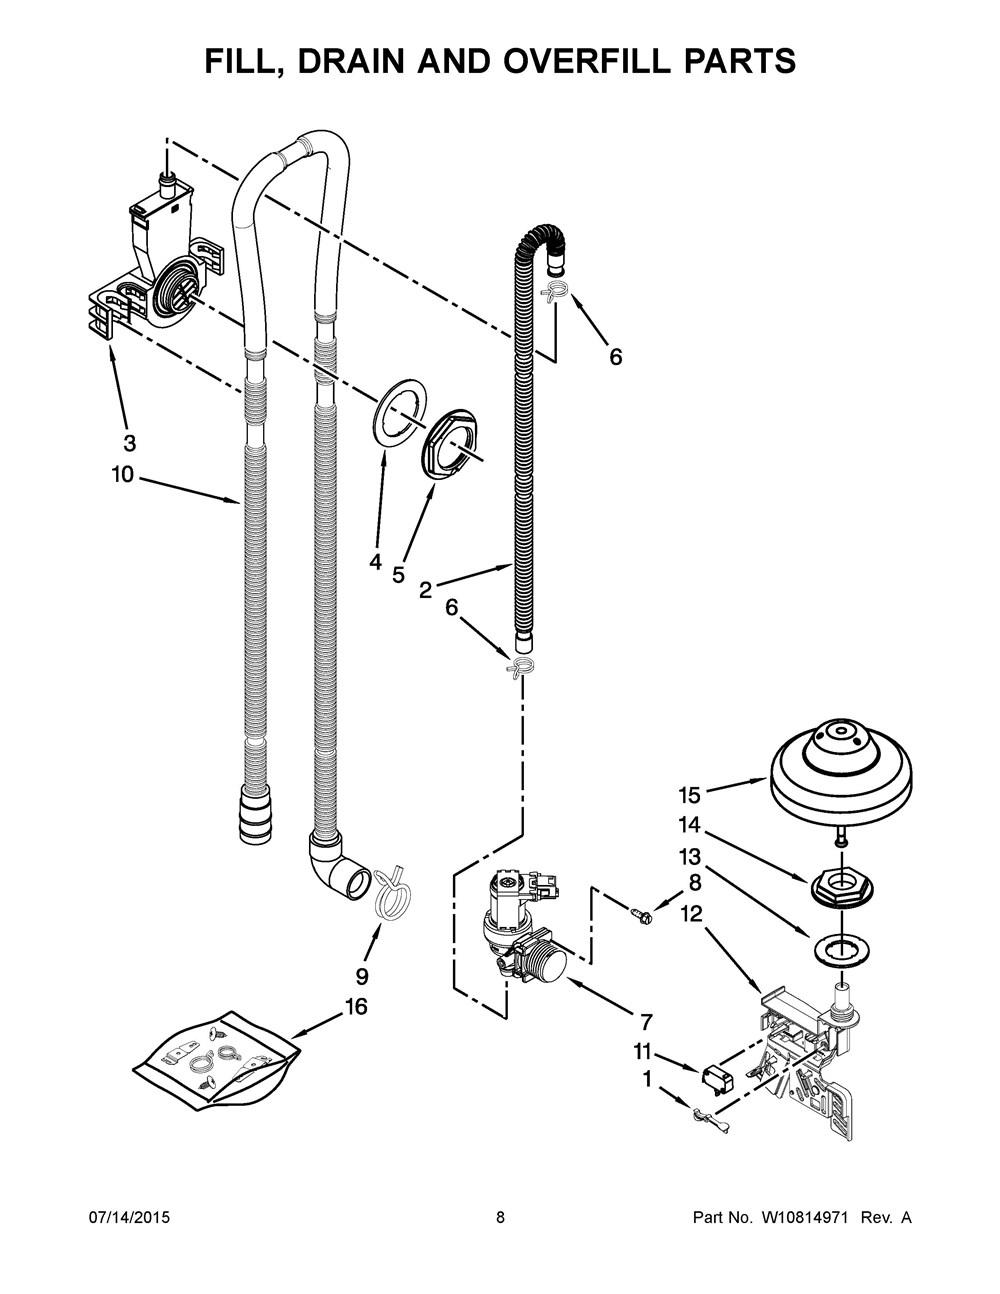 WDF760SADM2 Whirlpool Corporation – Kitchenaid Dishwasher Wiring Harness Diagram